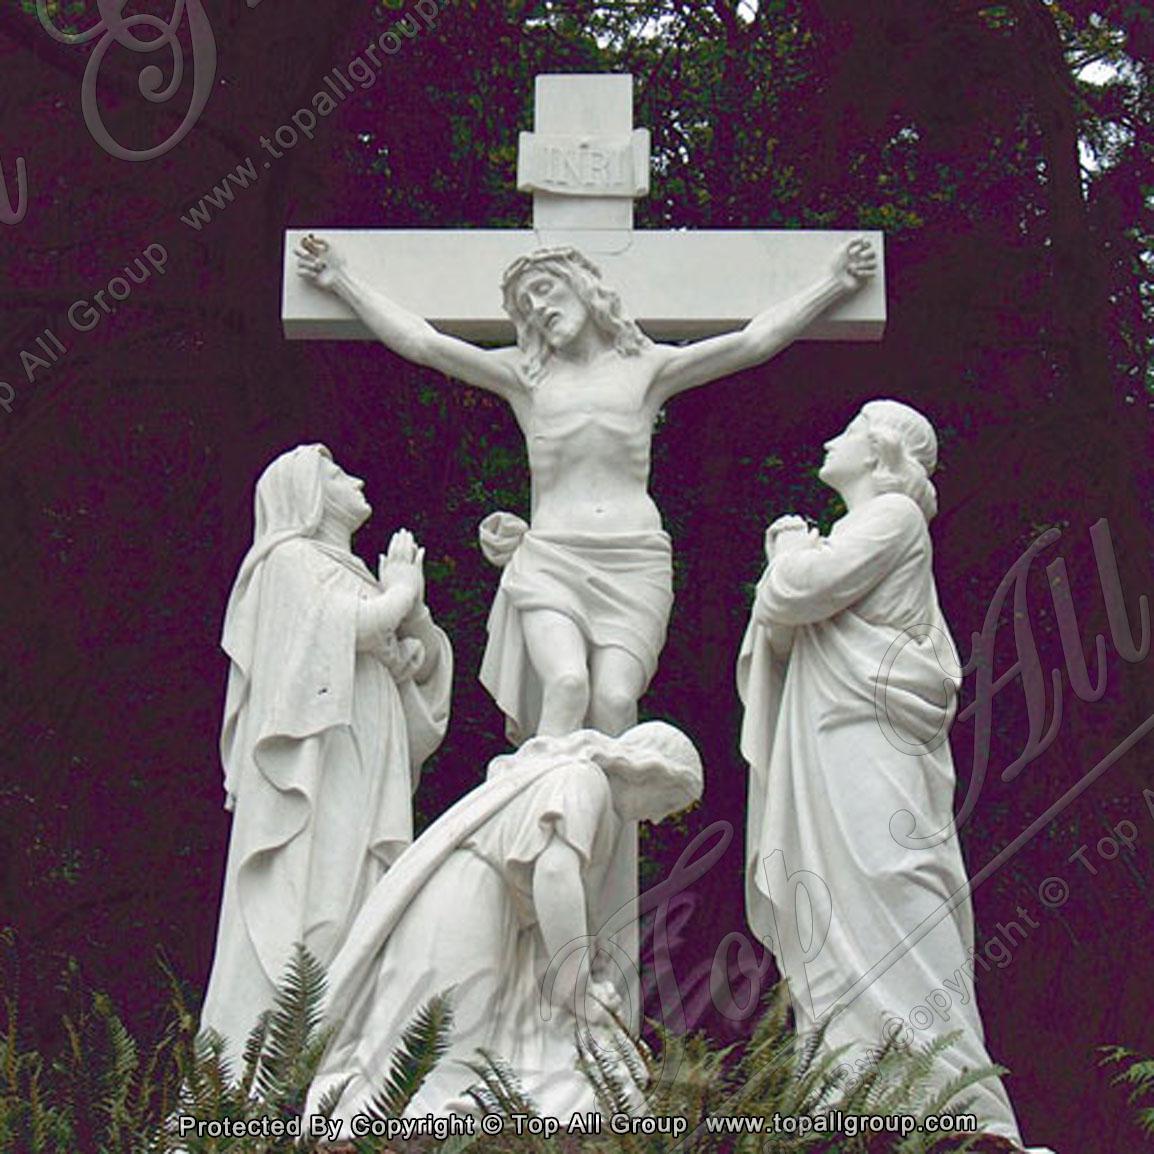 Religious statues of crucifix Jesus on cross 1